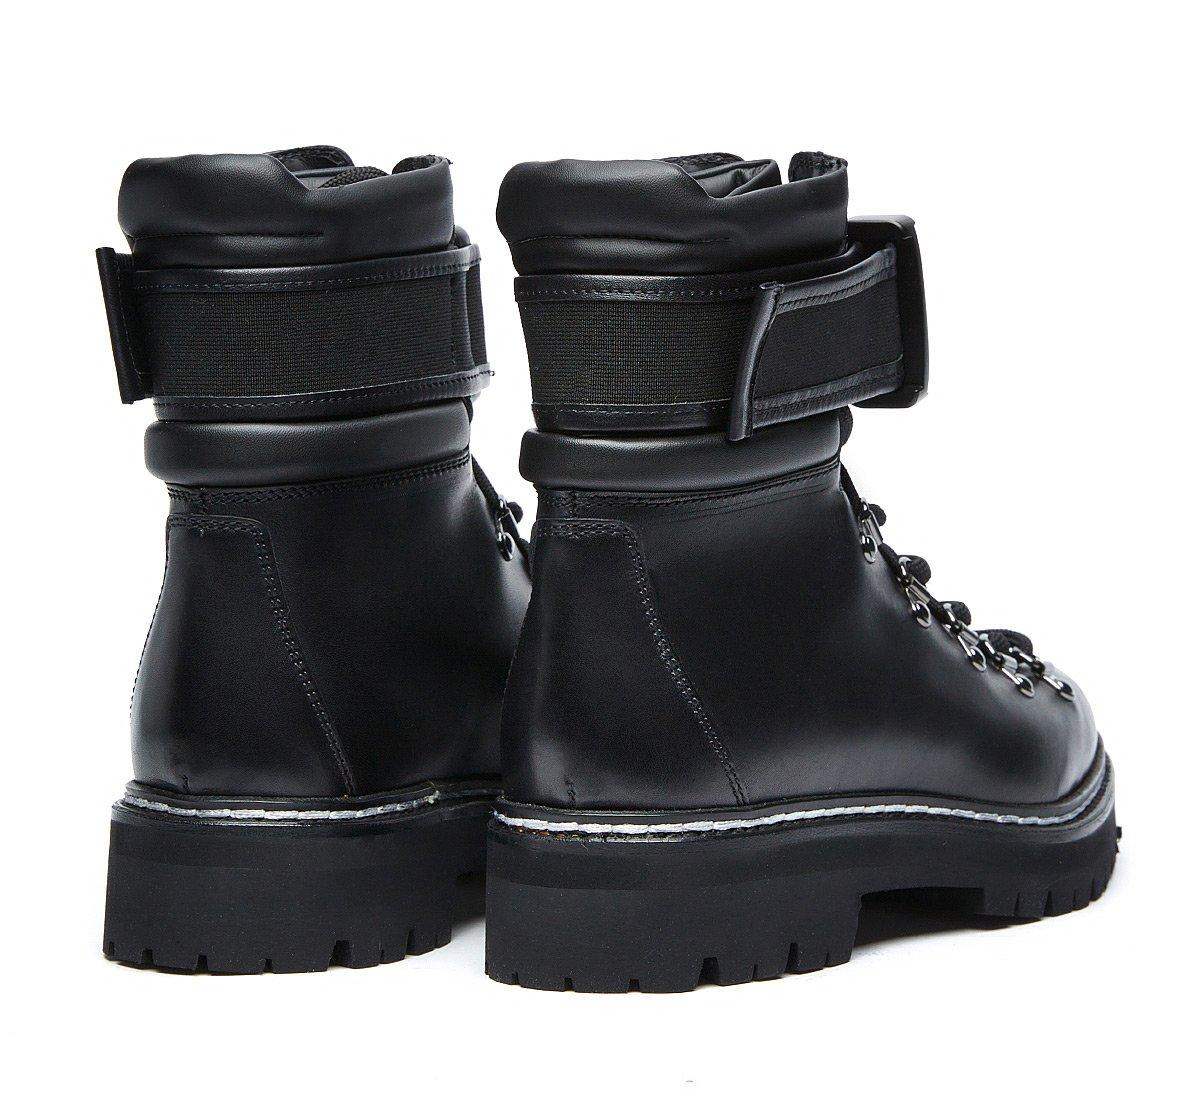 Barracuda commando boots in luxury calf leather